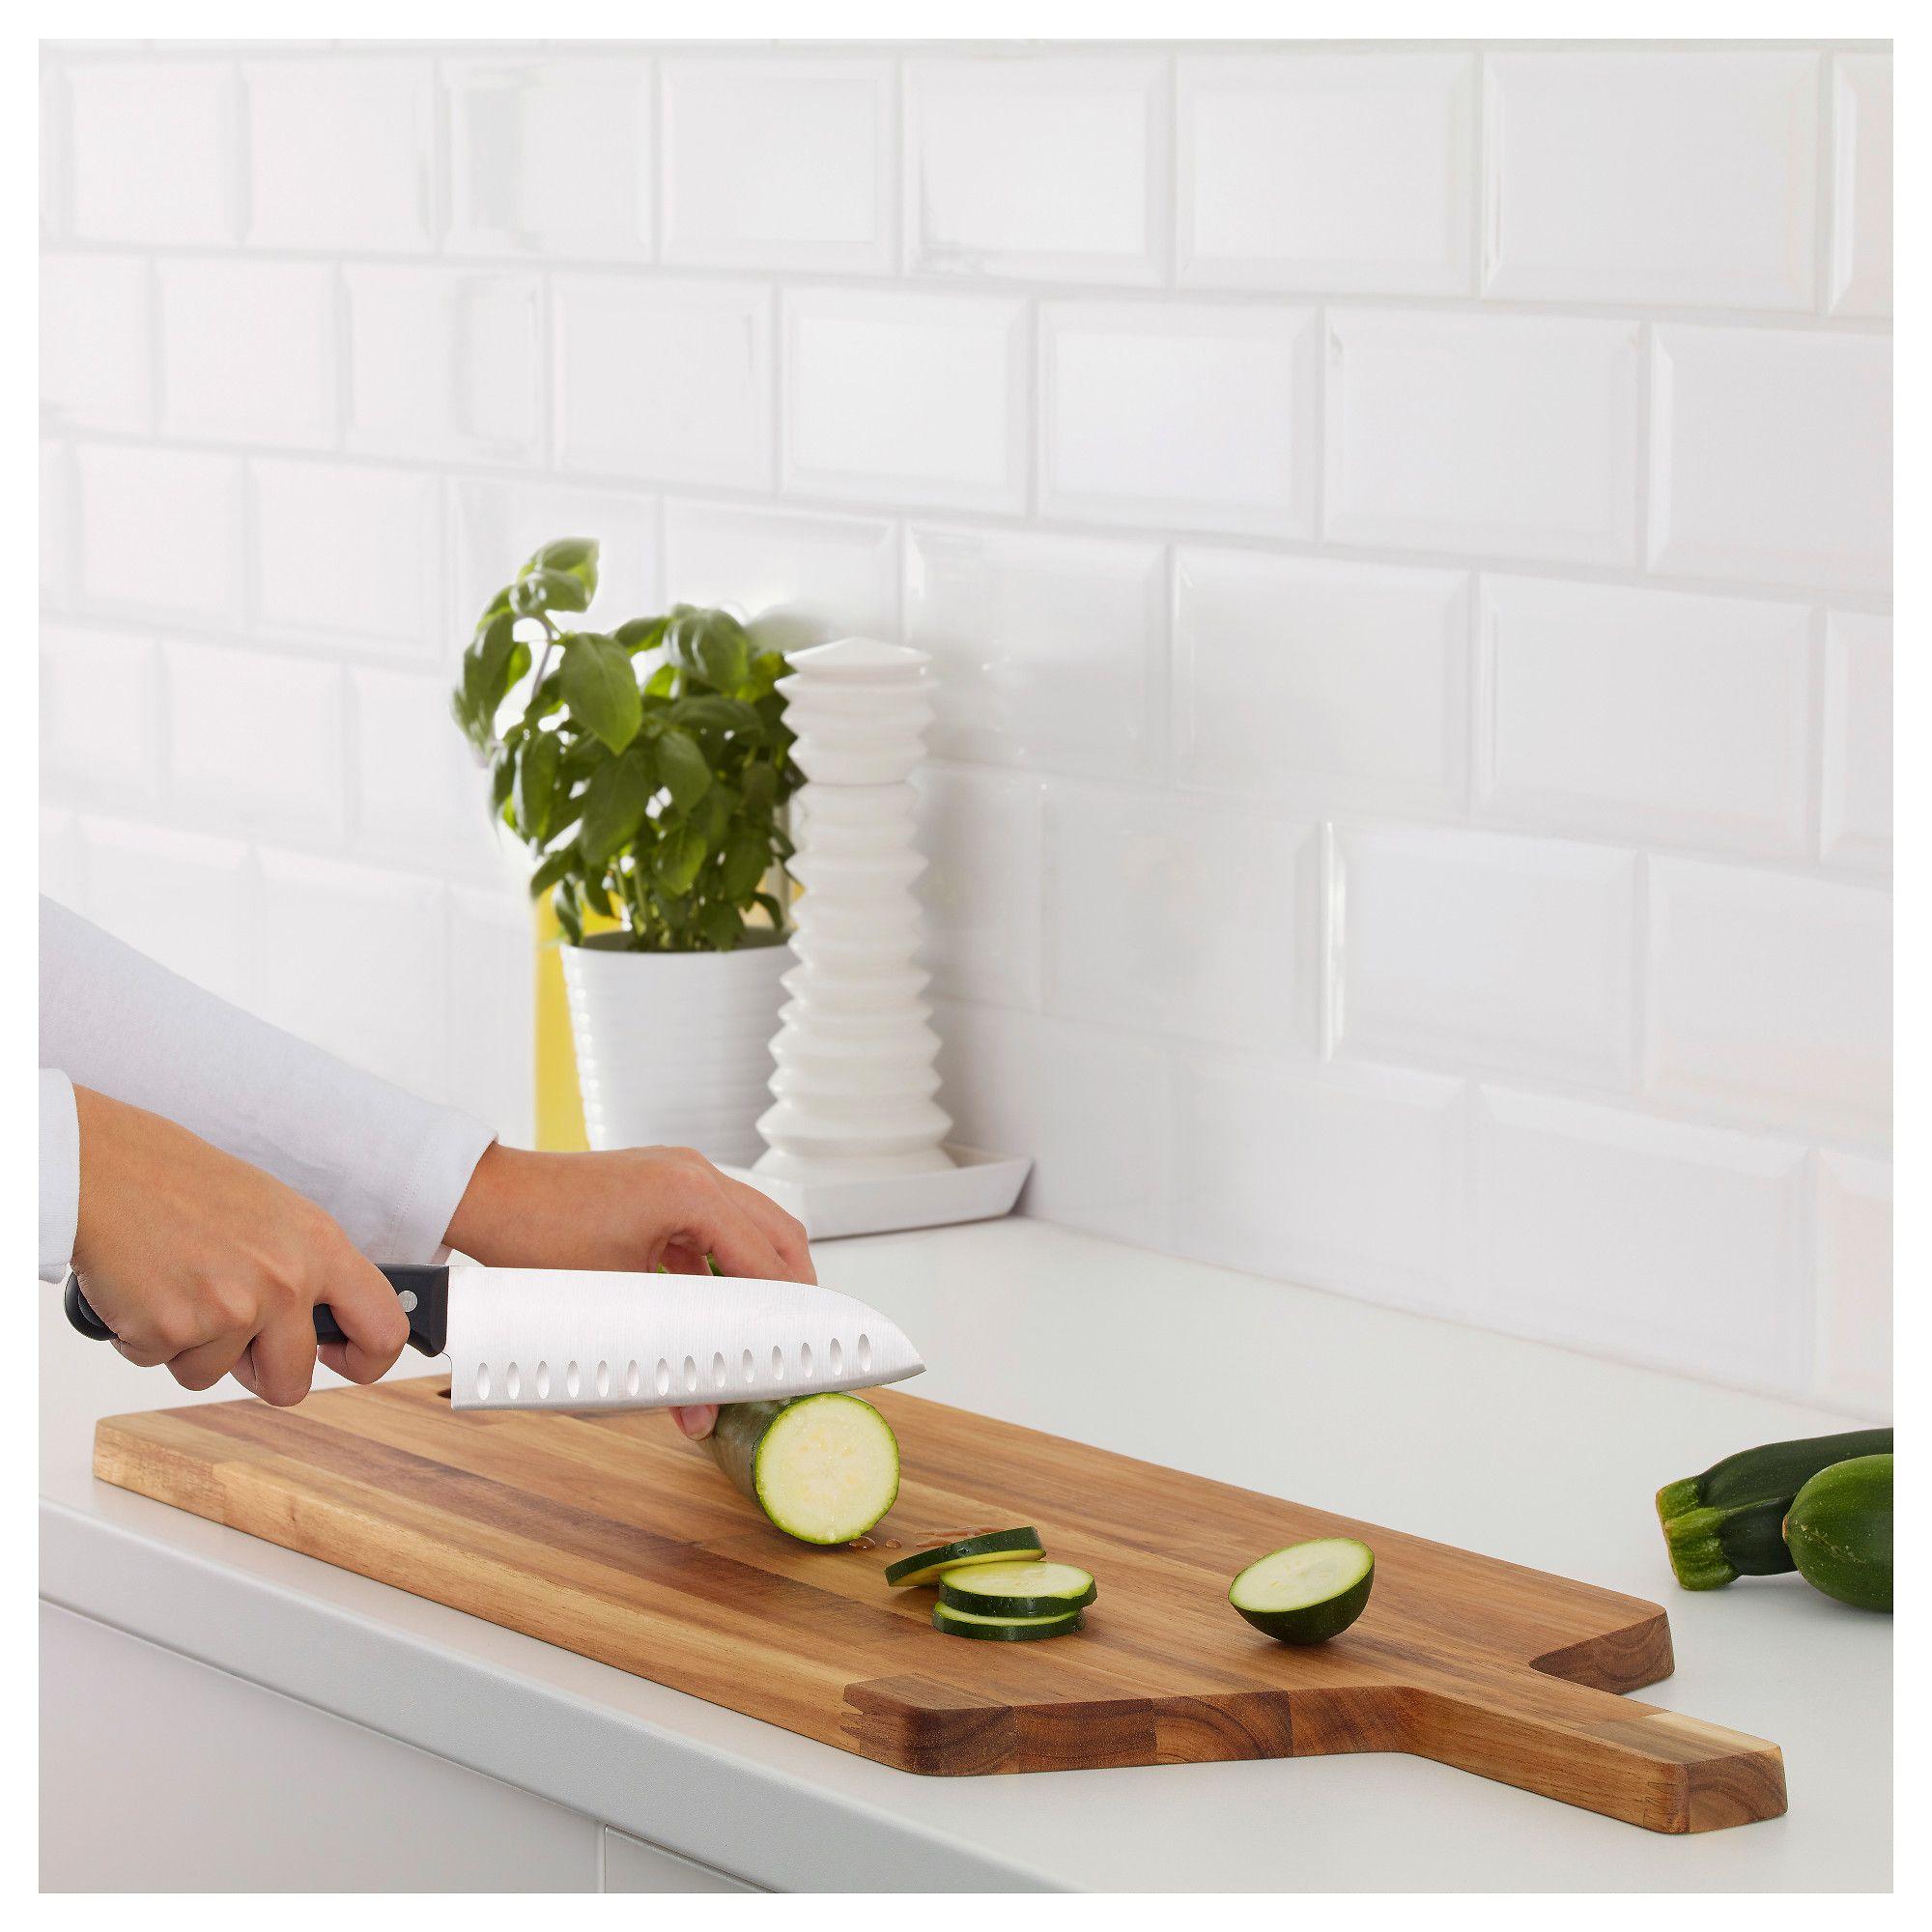 Ikea Småäta Chopping Board Acacia In 2019 Products Ikea